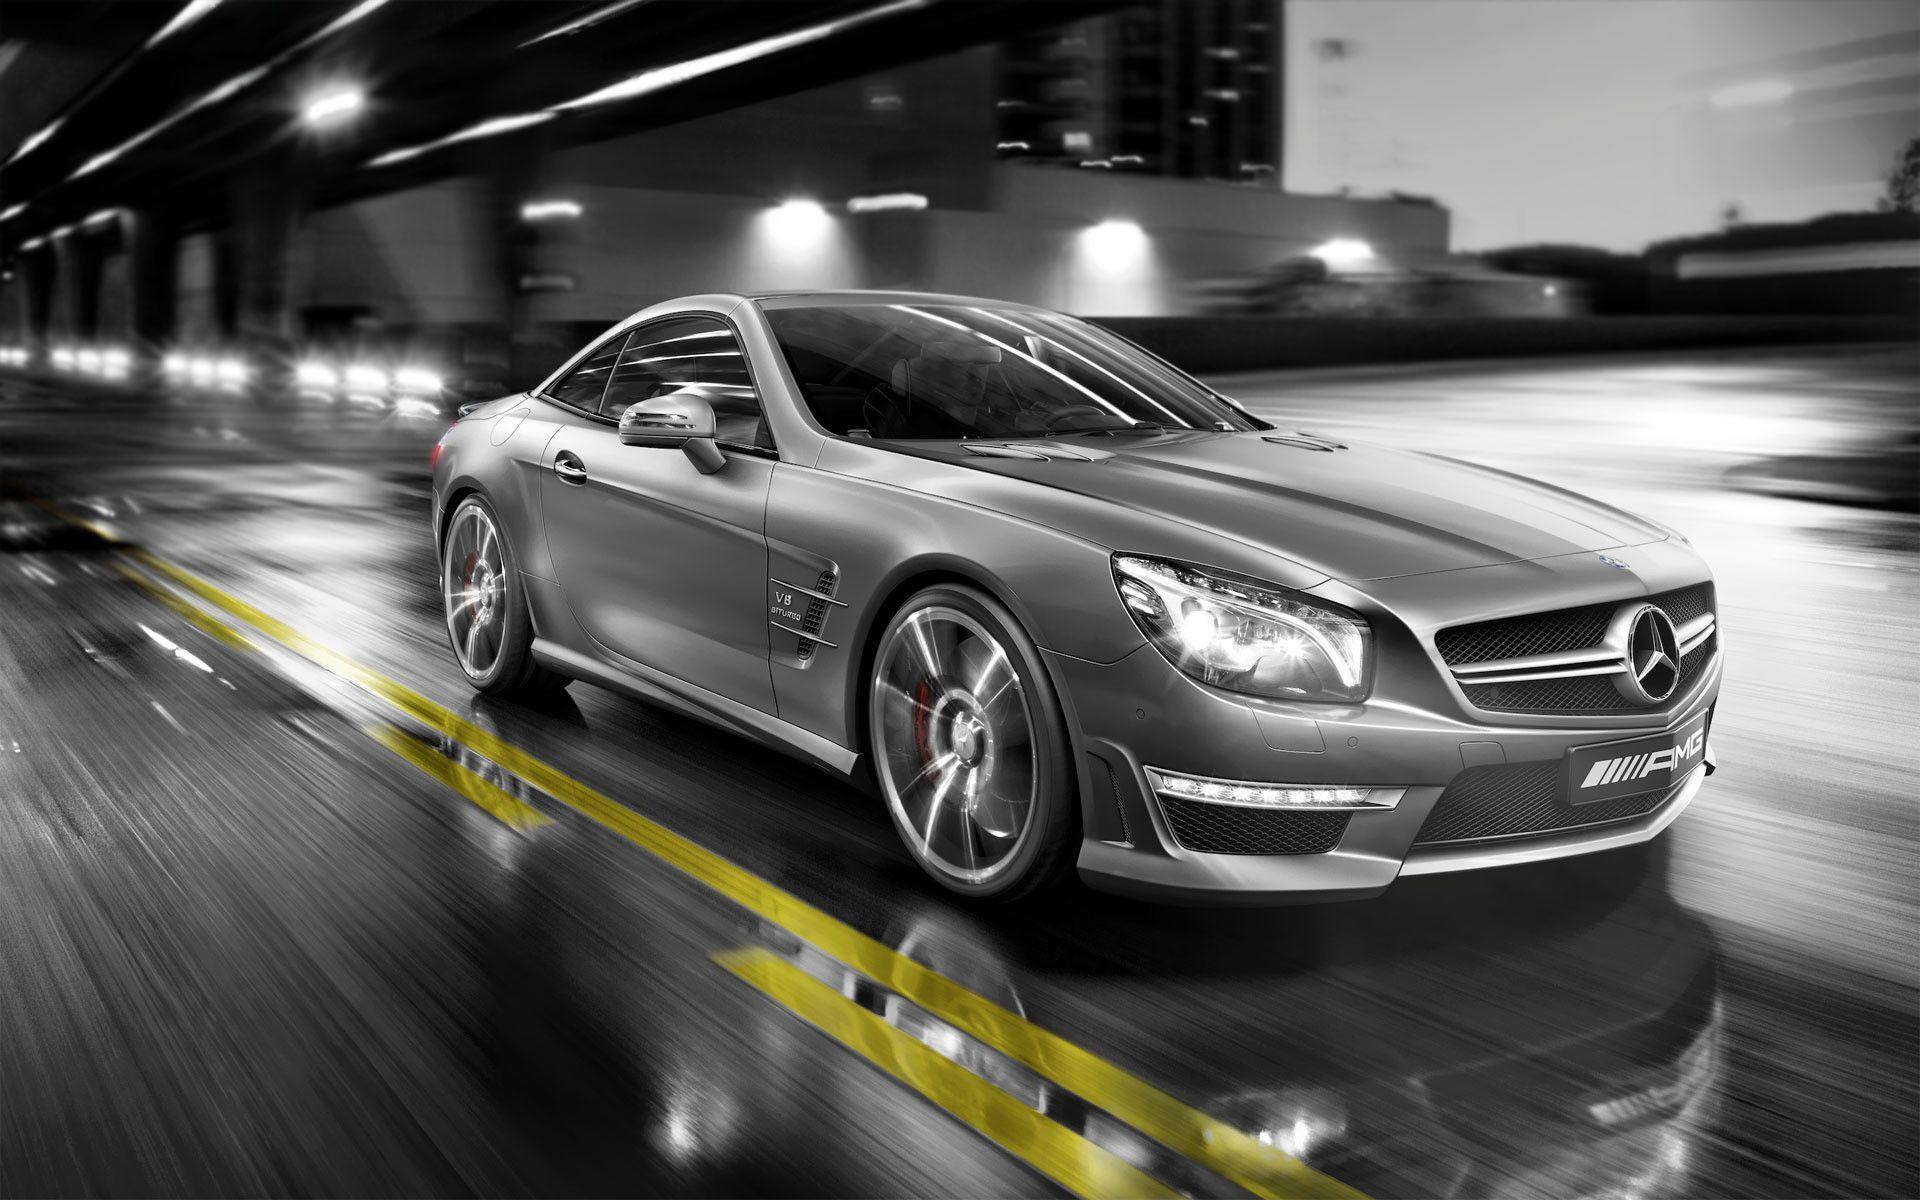 Mercedes Benz AMG Wallpapers - Wallpaper Cave